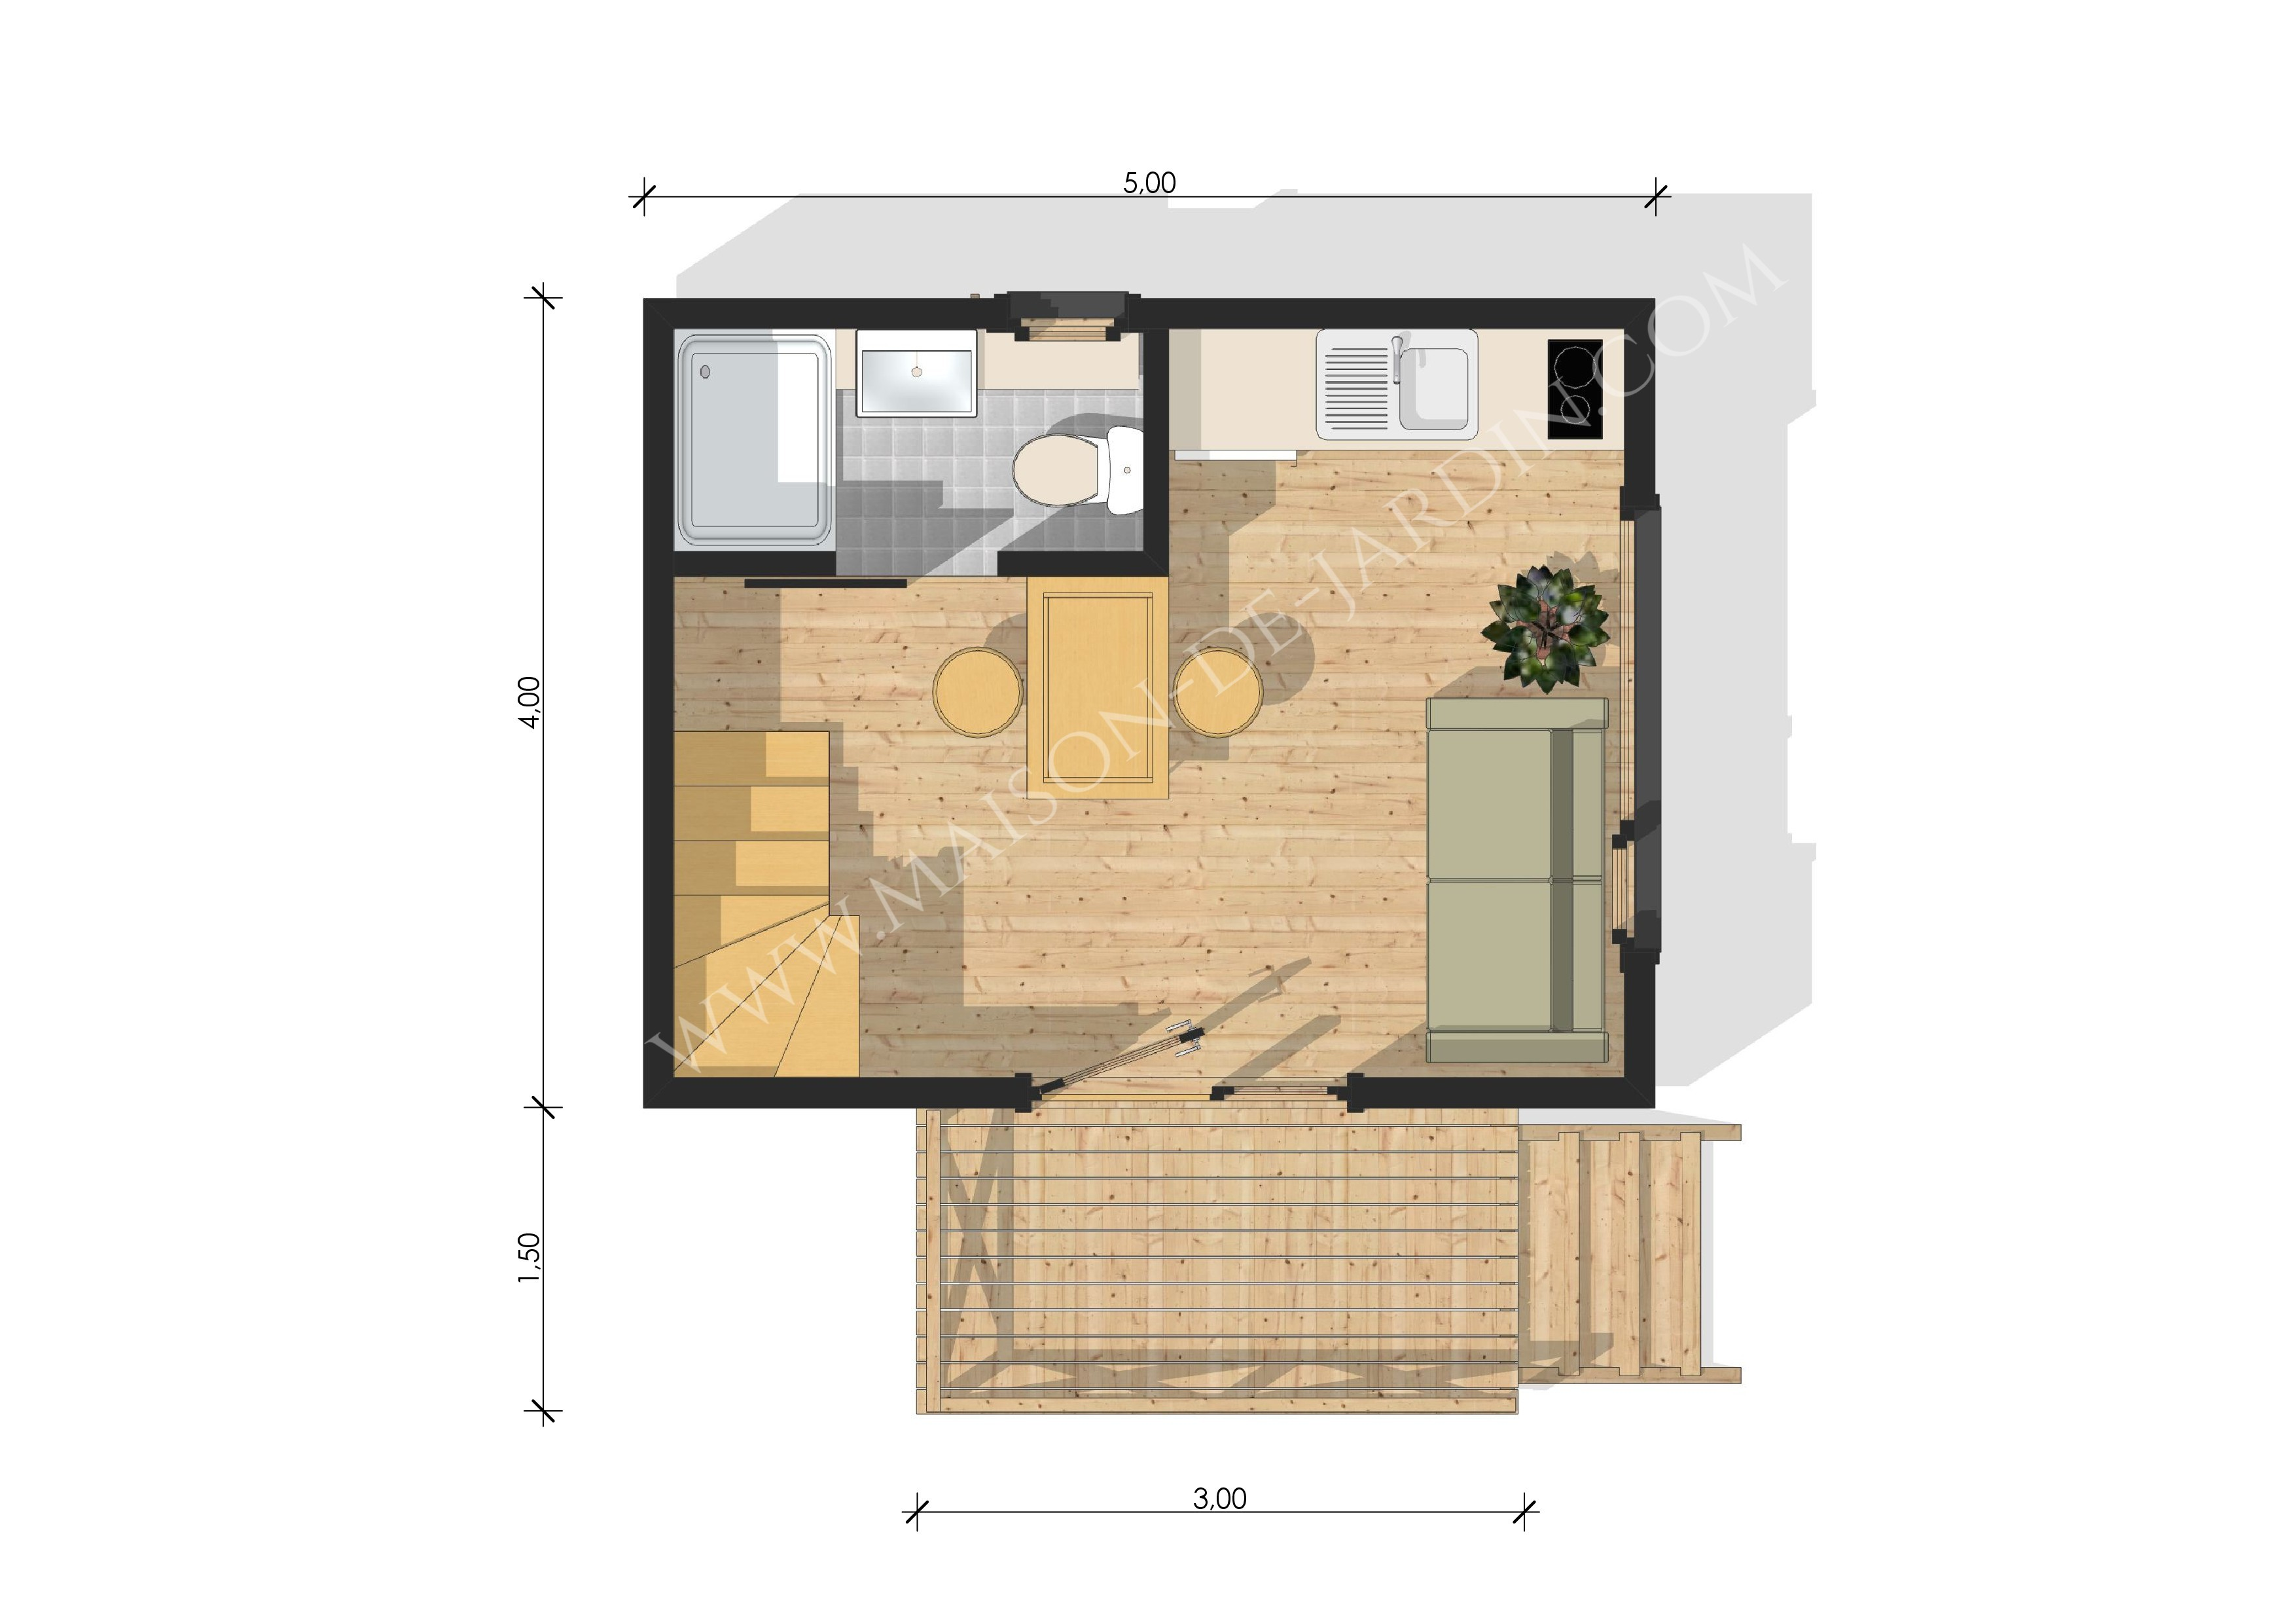 Maison de jardin strasbourg en bois en kit - Maison de jardin kit mulhouse ...